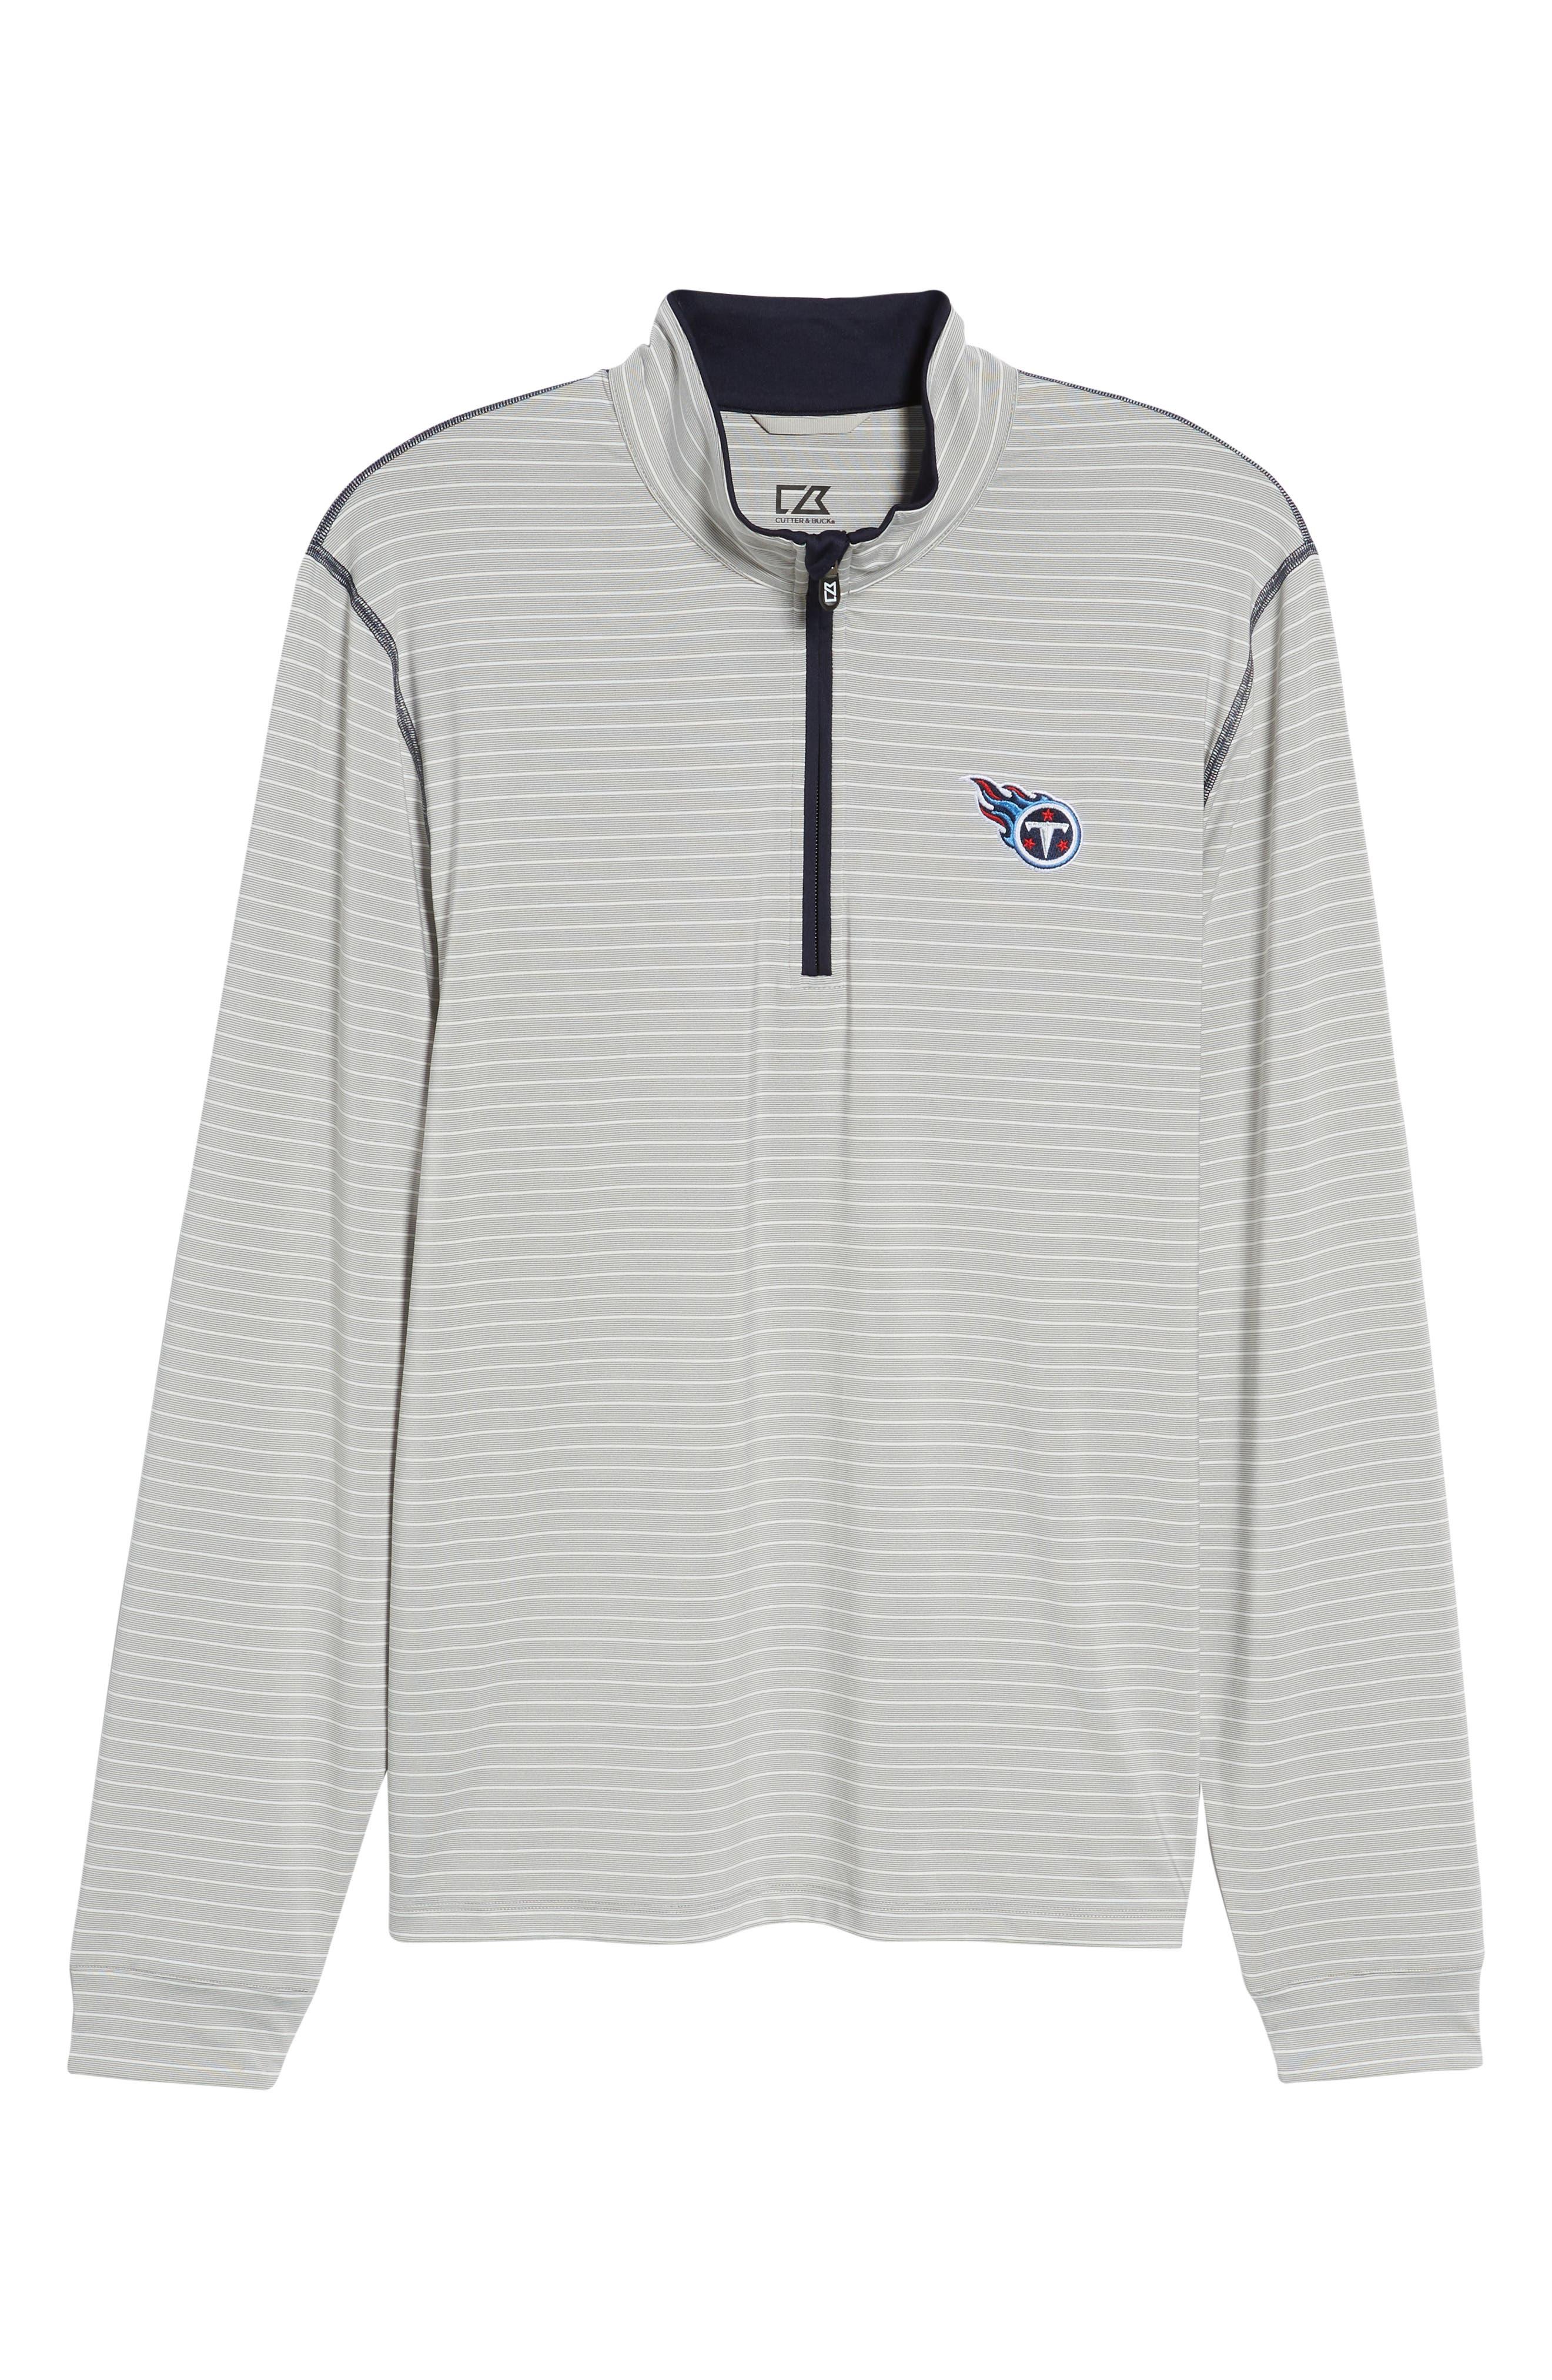 Meridian - Tennessee Titans Regular Fit Half Zip Pullover,                             Alternate thumbnail 6, color,                             NAVY